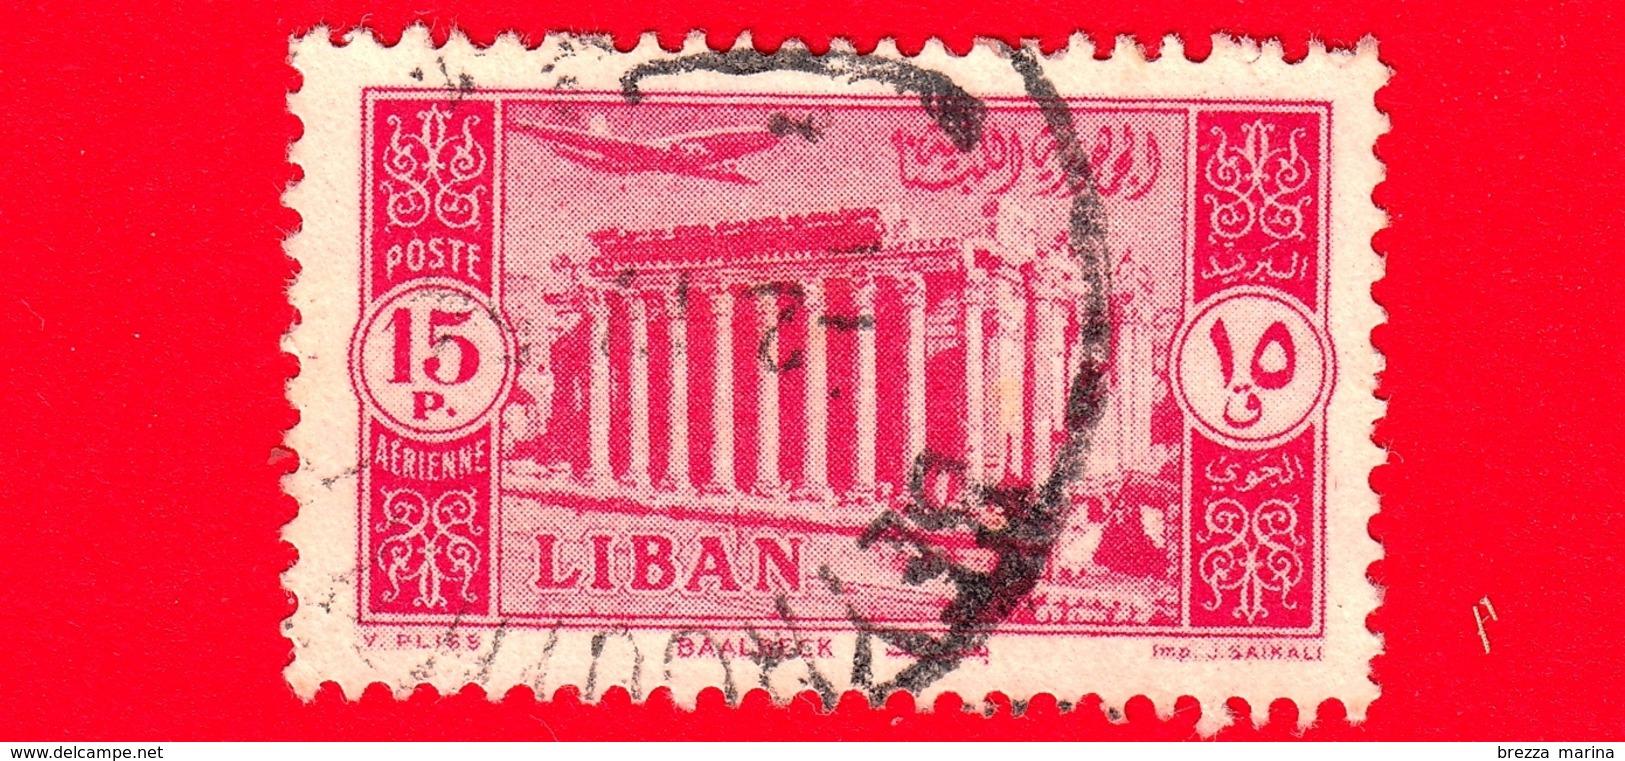 LIBANO - Usato - 1954 - Paesaggi - Rovine Di Baalbek - 15 P. Aerea - Libano